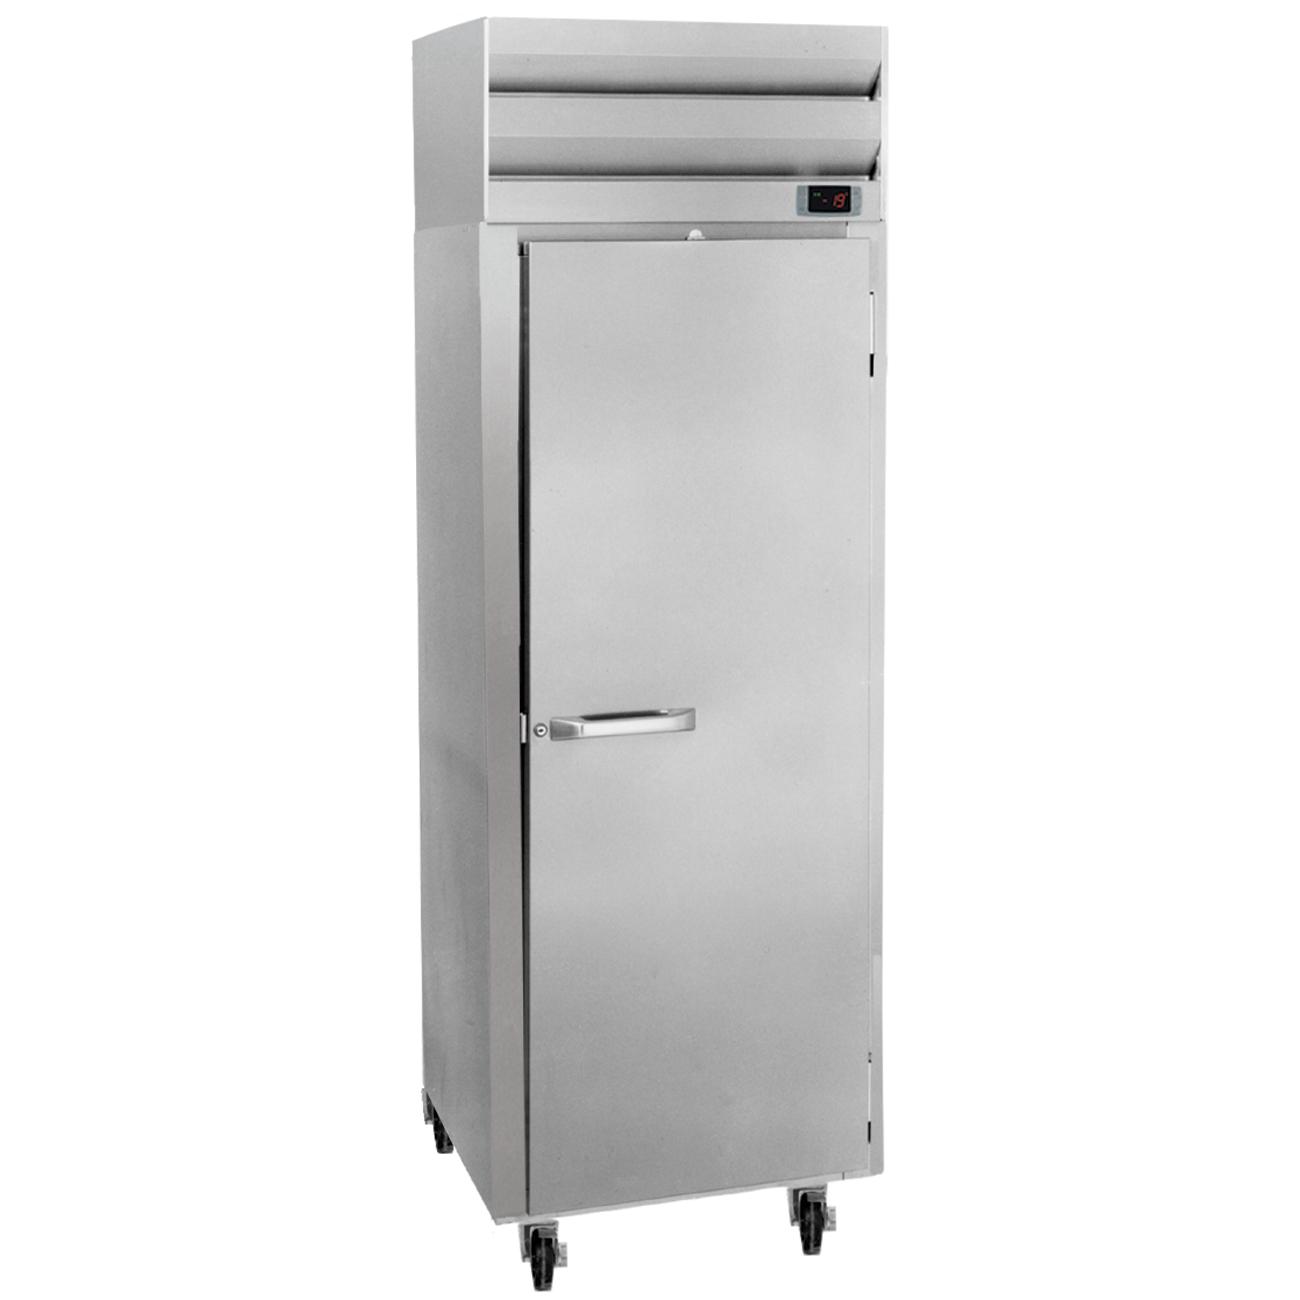 Howard-McCray SR22-P refrigerator, reach-in